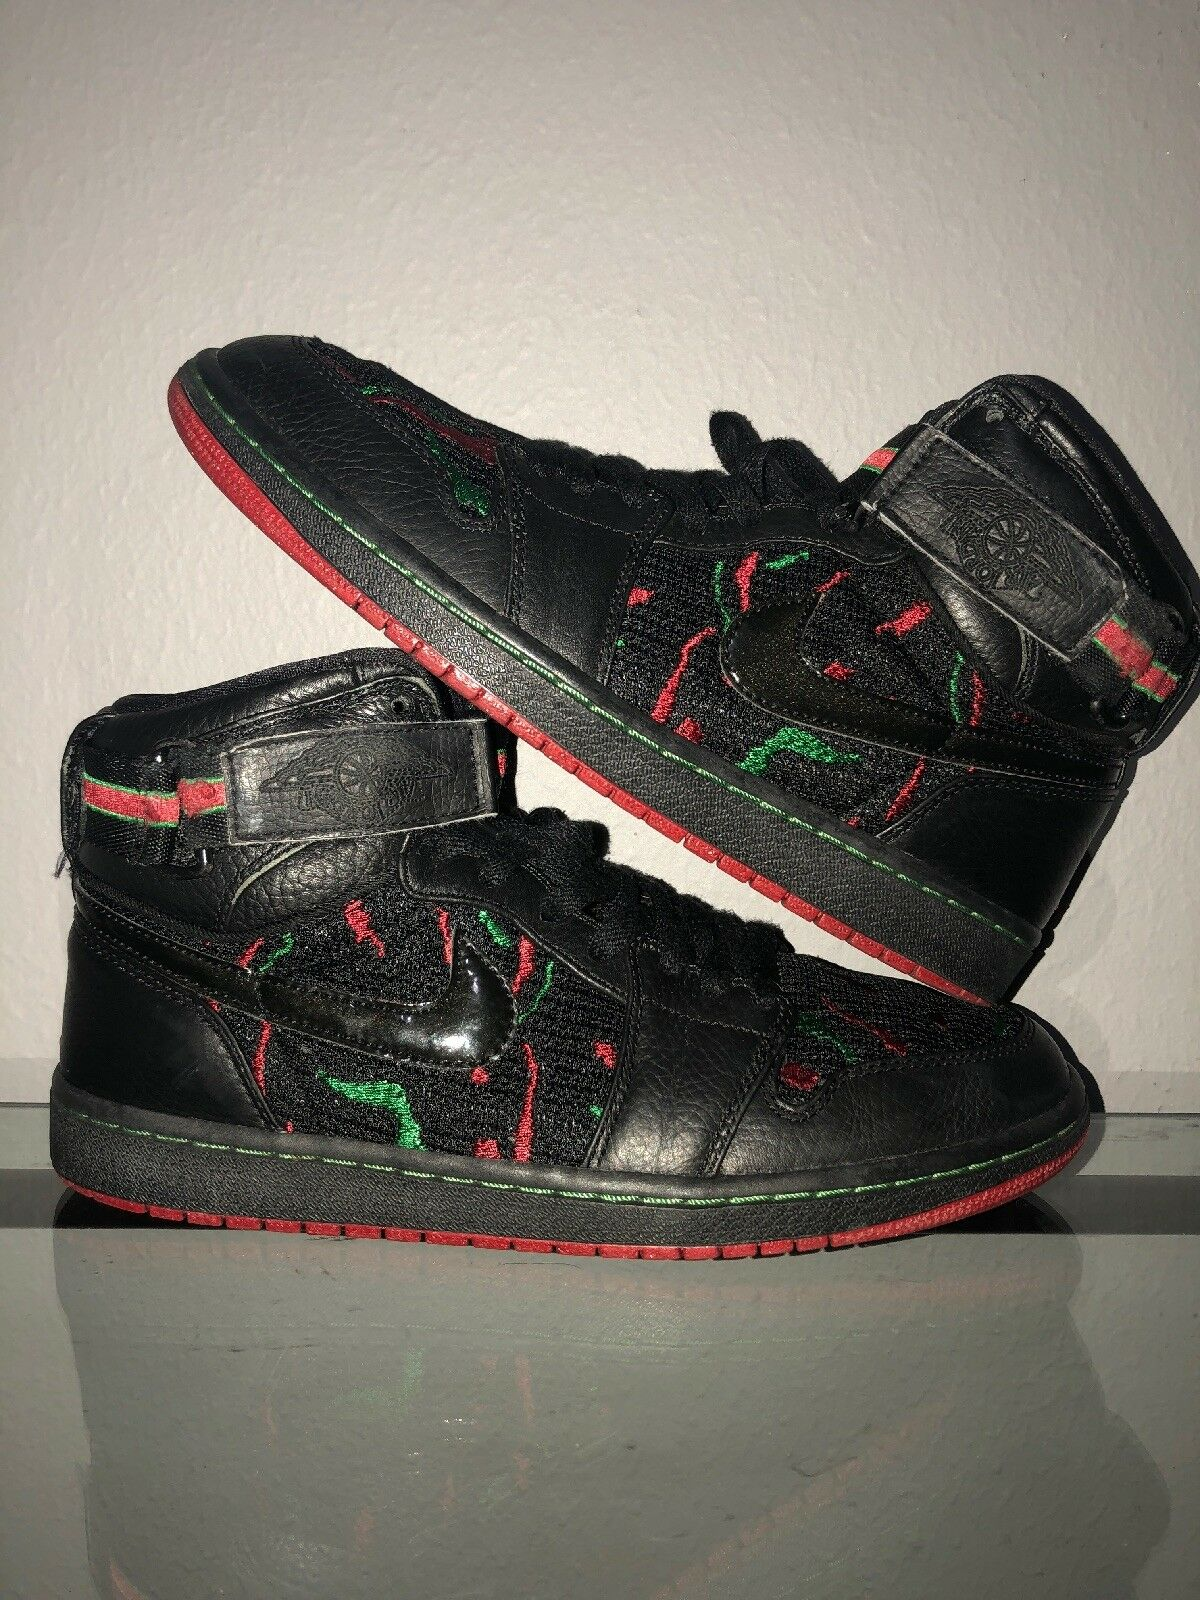 Nike Jordan Air Strap High 1 4e42fyapy41678 Athletic Shoes